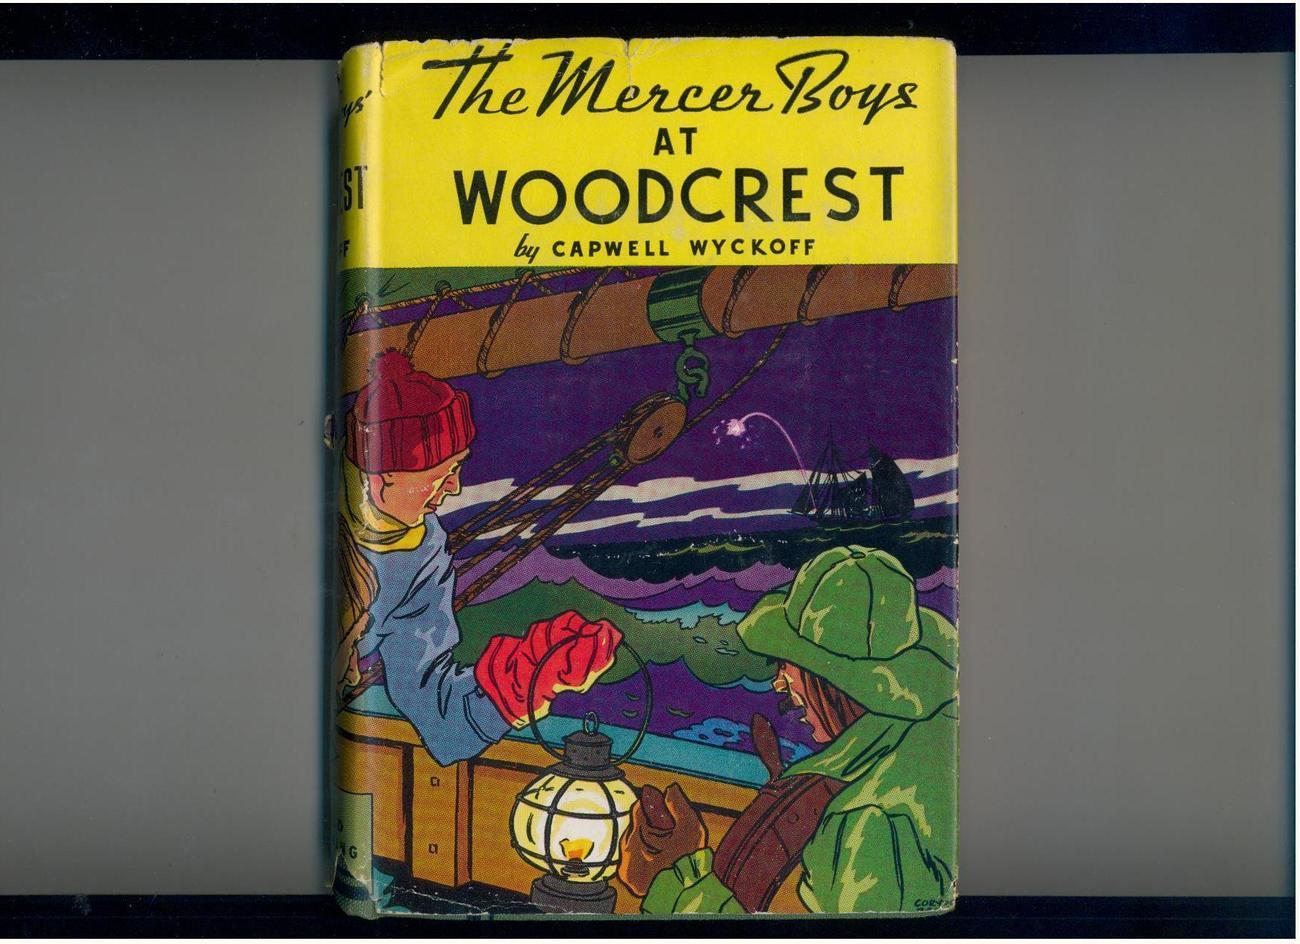 Wyckoff--MERCER BOYS AT WOODCREST--early pr.--in dust jacket